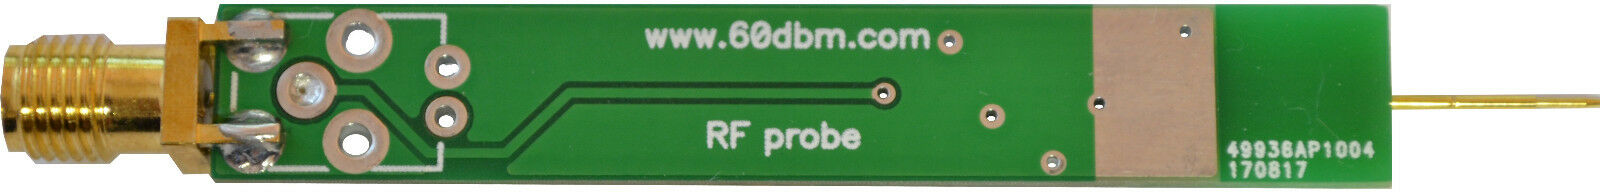 RF Active Probe 0 1-1500 MHz-1 5 GHz analyzer oscilloscope